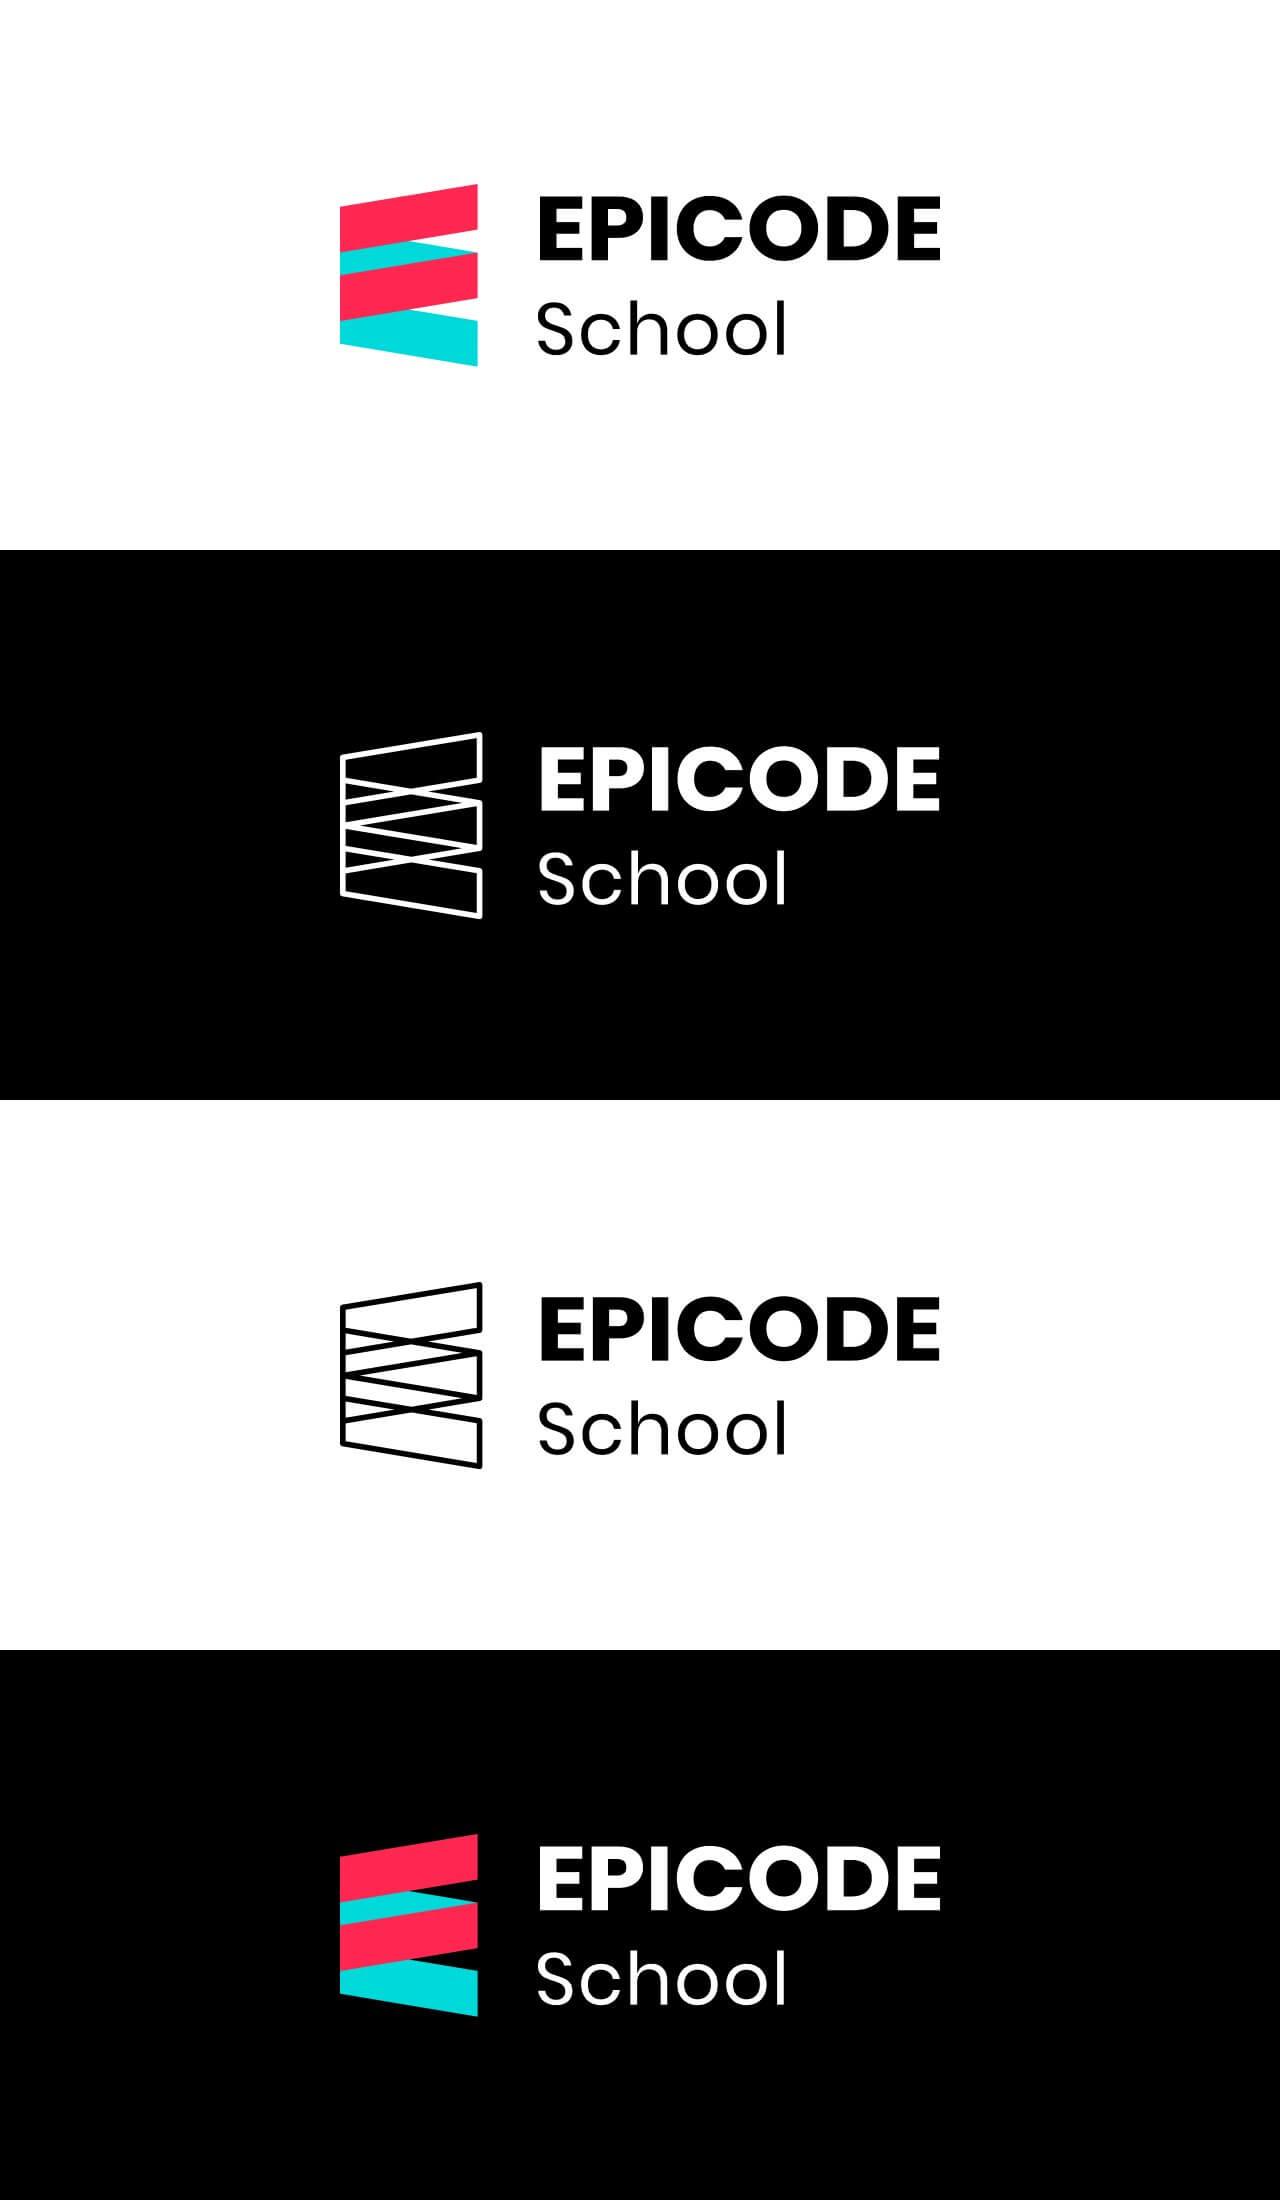 Group 21w82 Epicode School 3 Baasbox